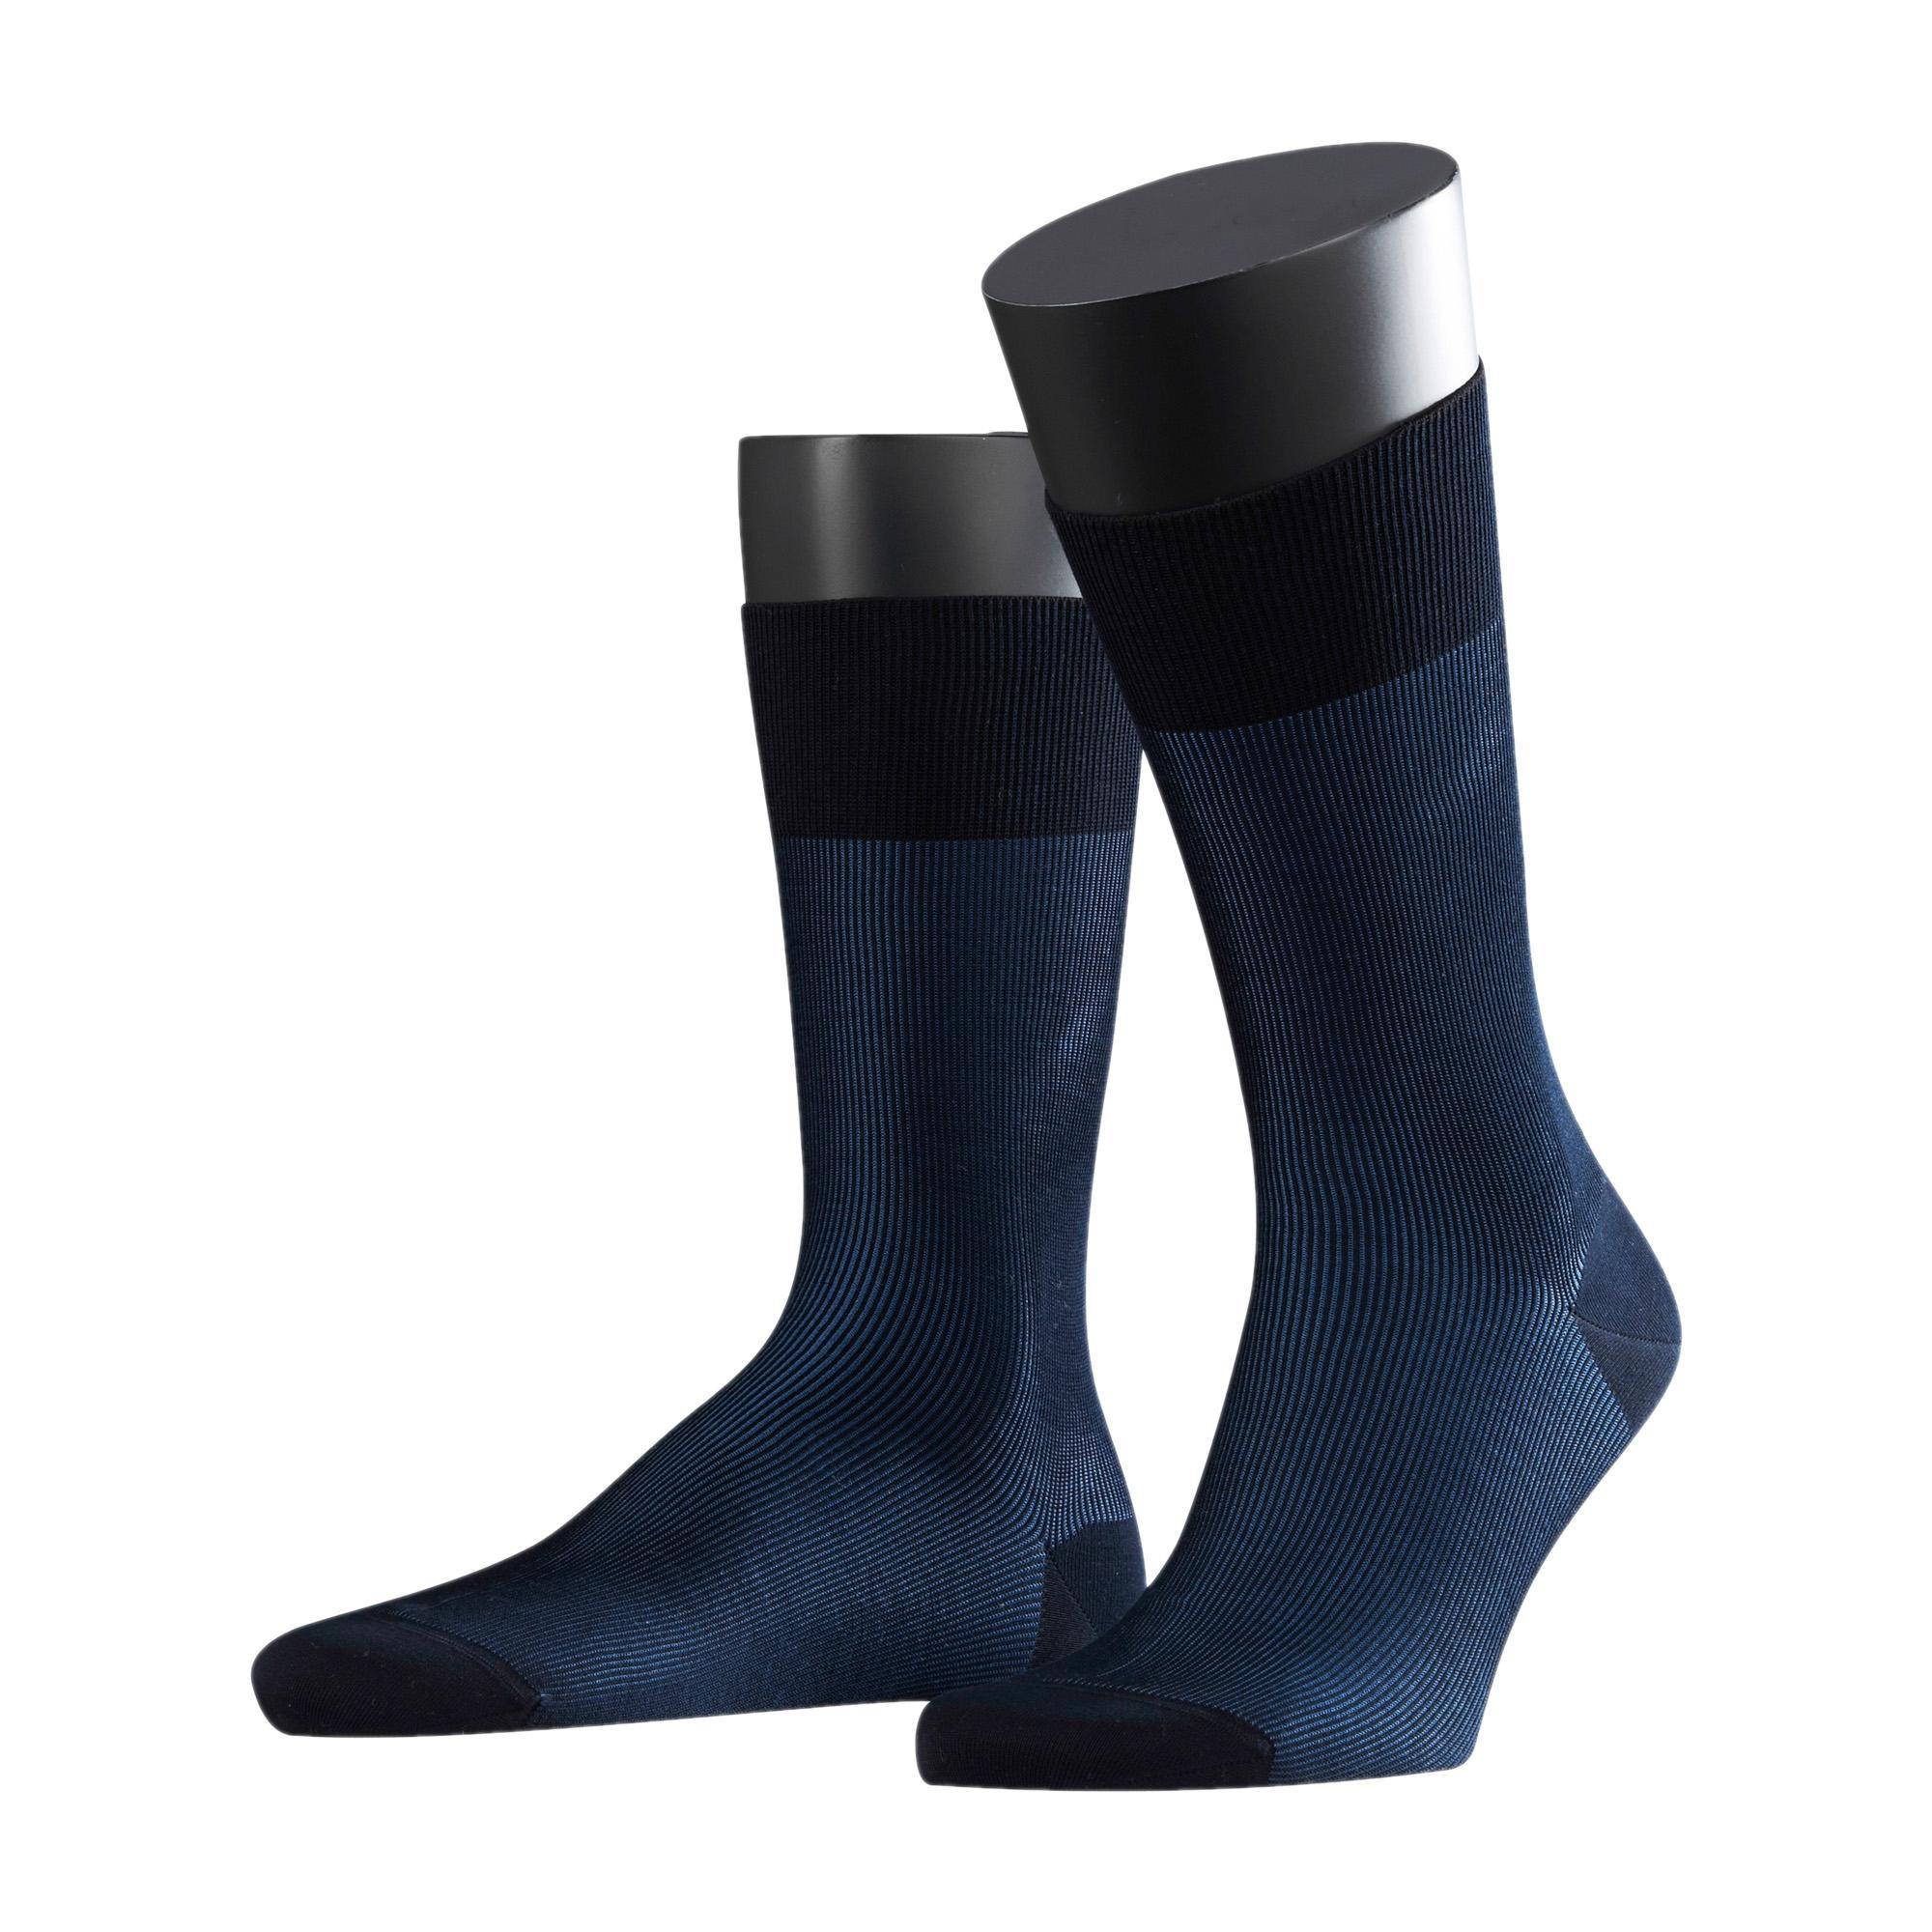 Fine Shadow socks